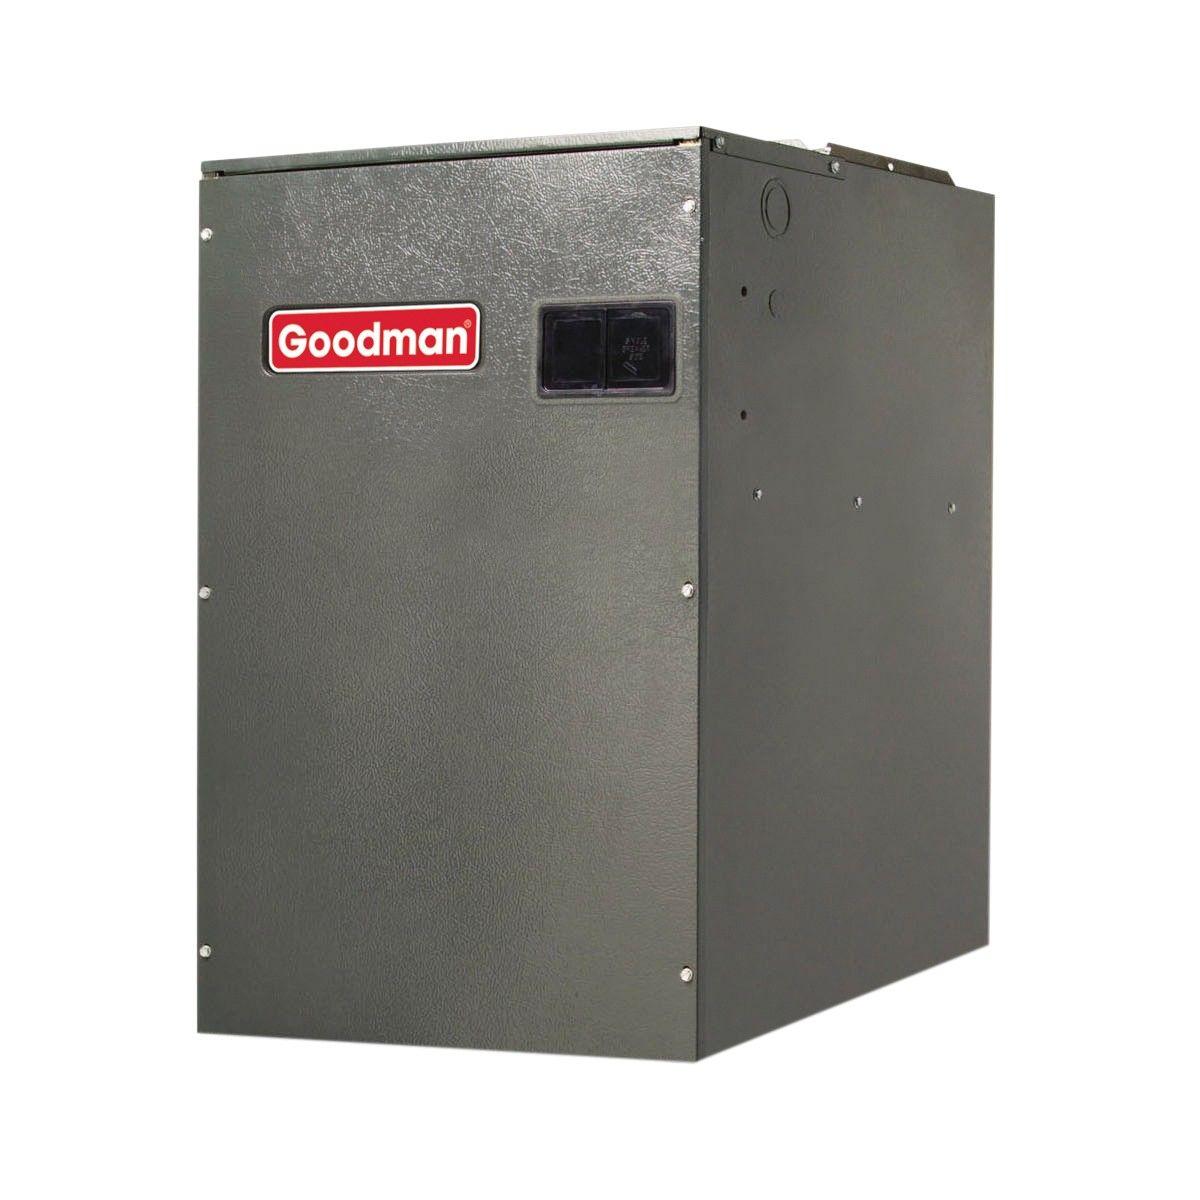 Goodman MBVC 1600 CFM Variable-Speed Modular Blower